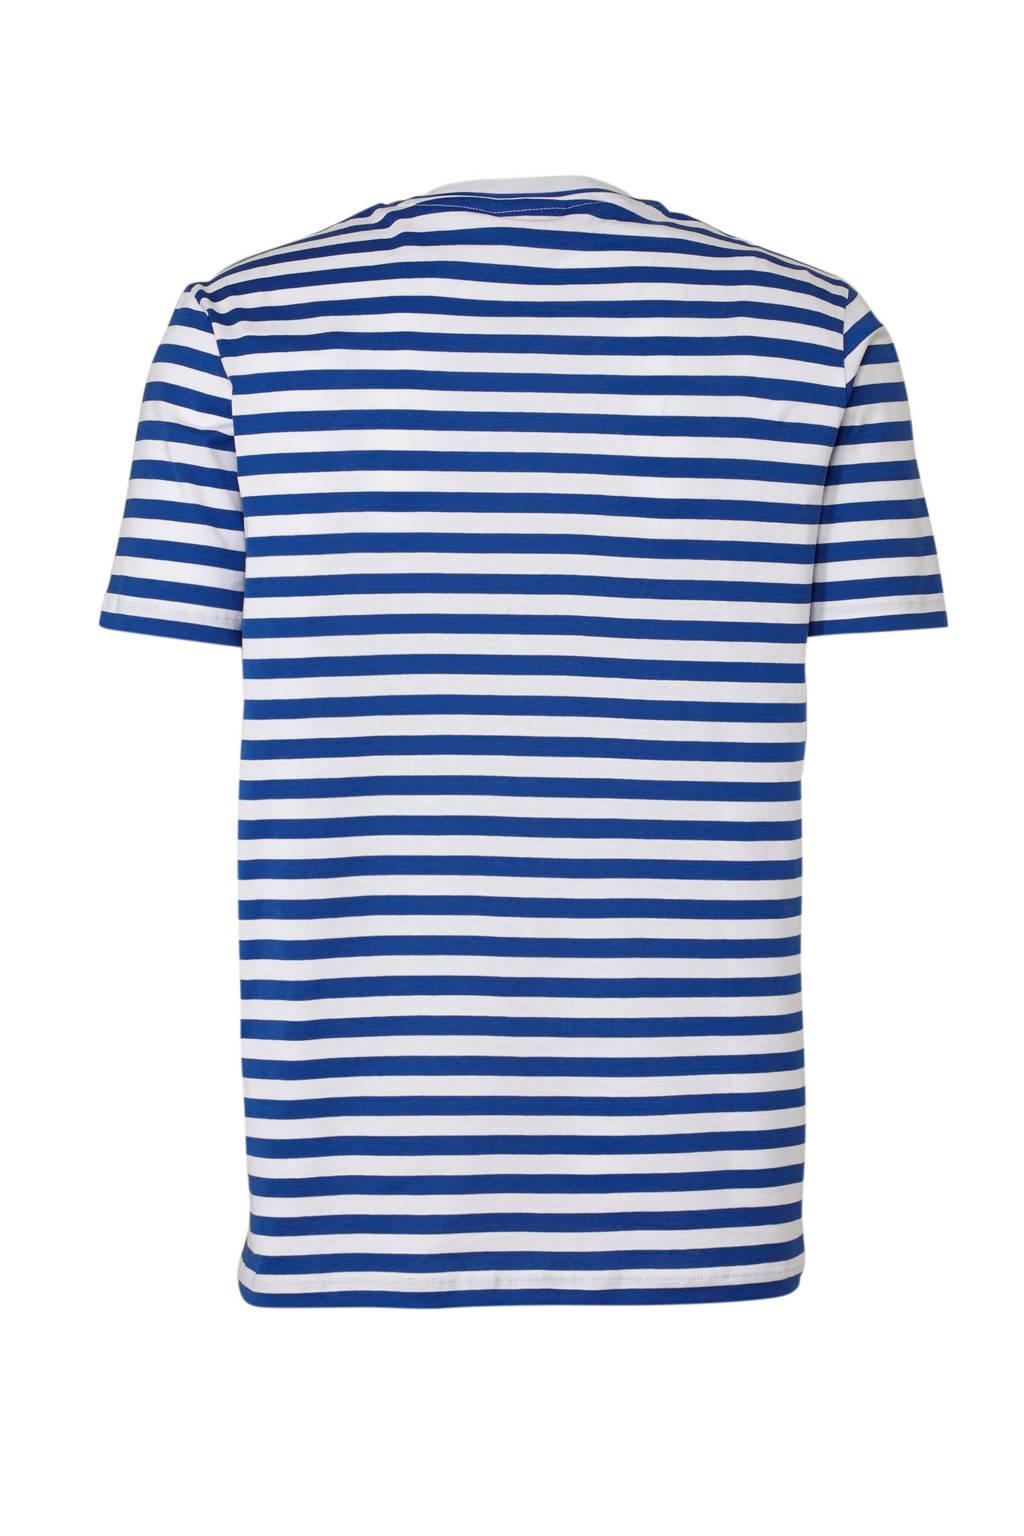 HUGO gestreept T-shirt blauw, Blauw/wit